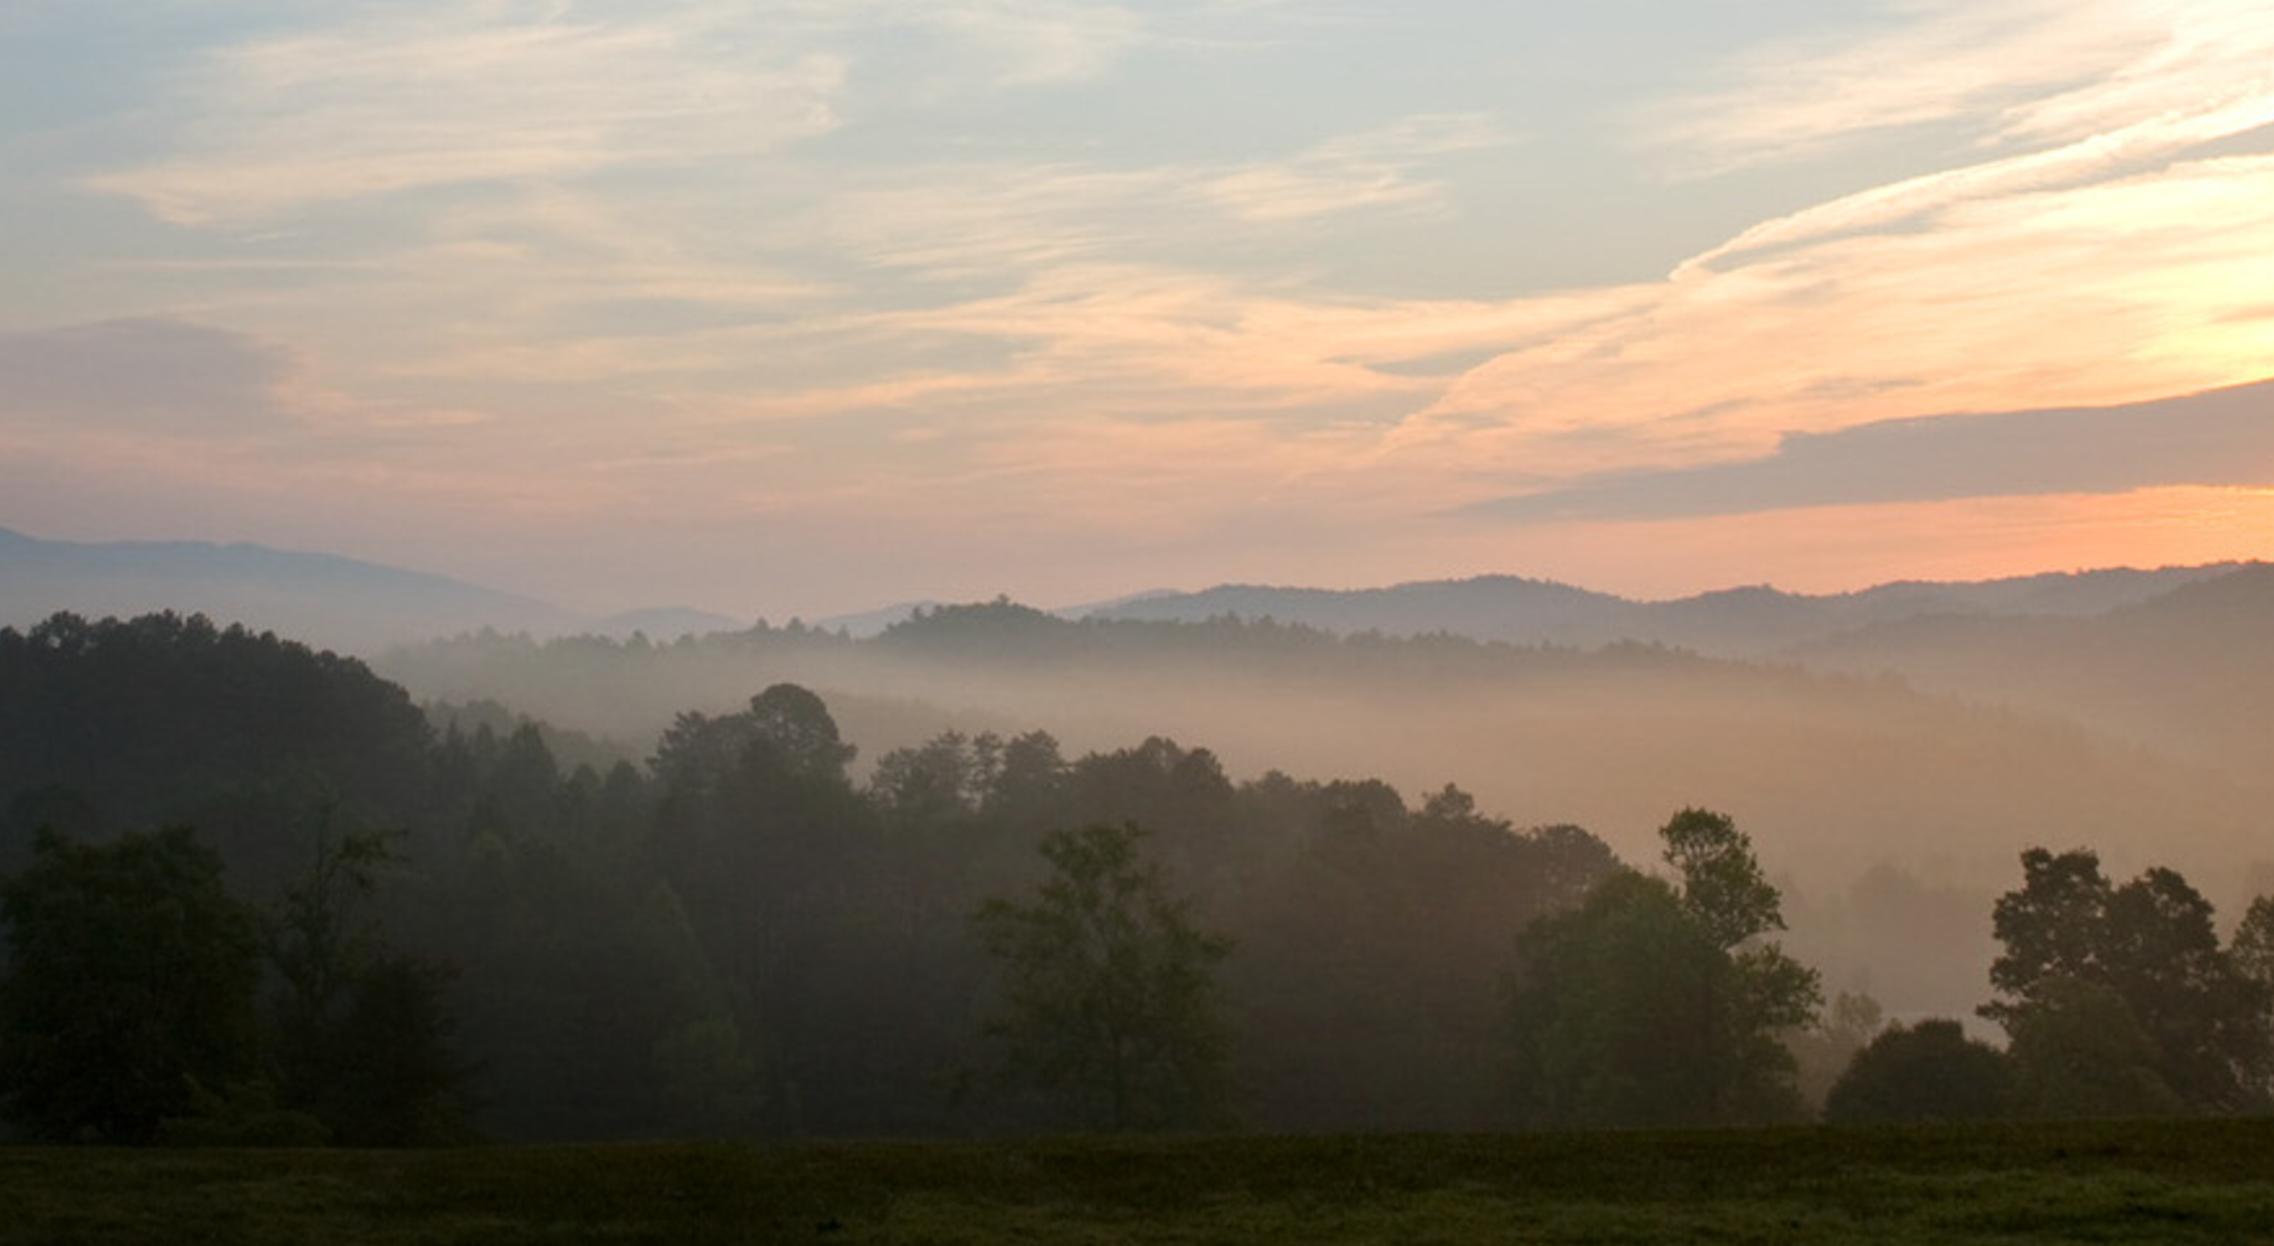 Image from Blackberry Farm website